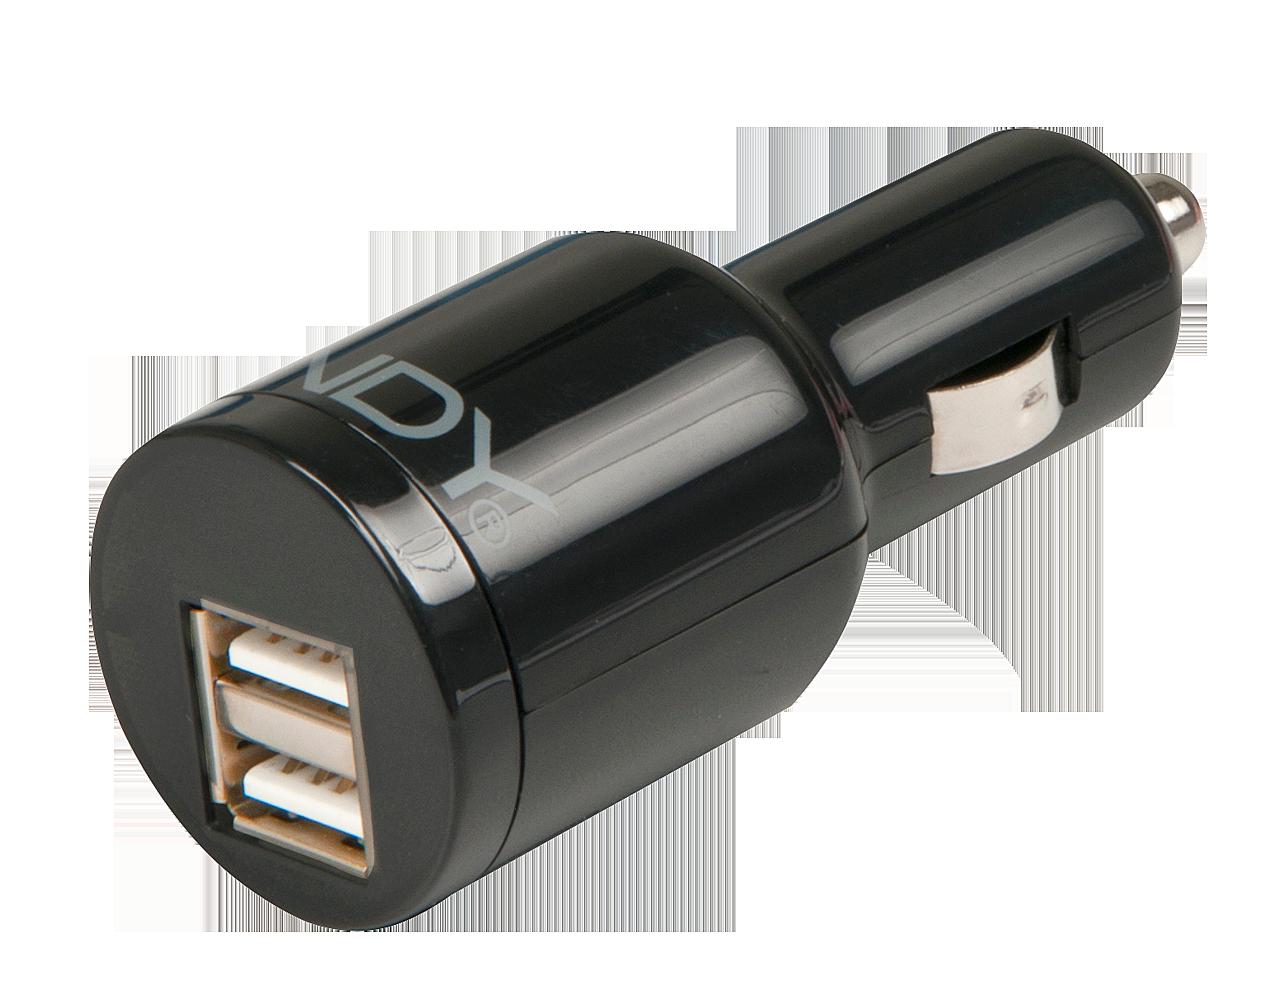 USB Auto-Ladeadapter 2 Port